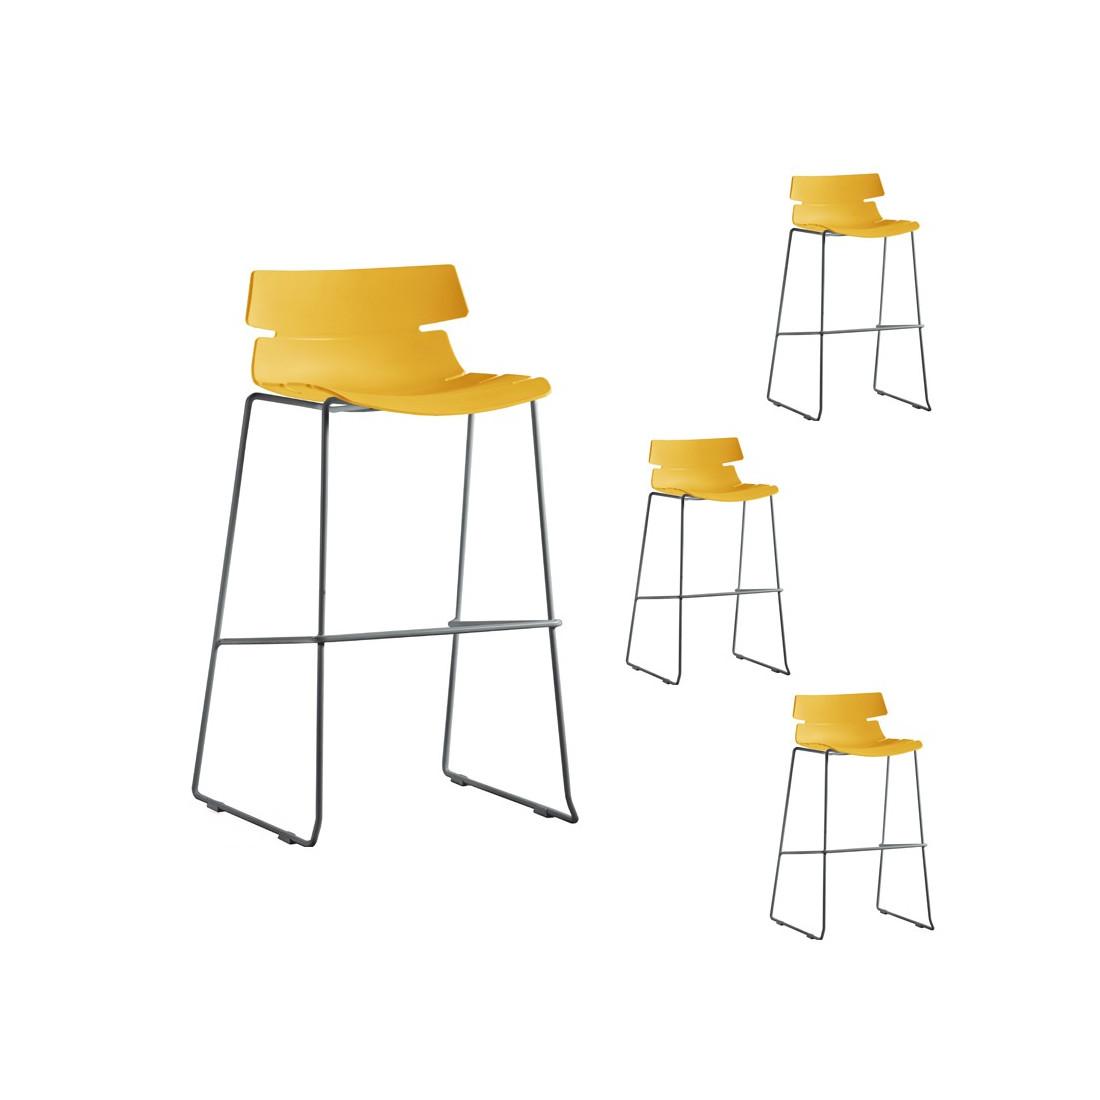 quatuor de tabourets de bar moutarde siry univers salon. Black Bedroom Furniture Sets. Home Design Ideas